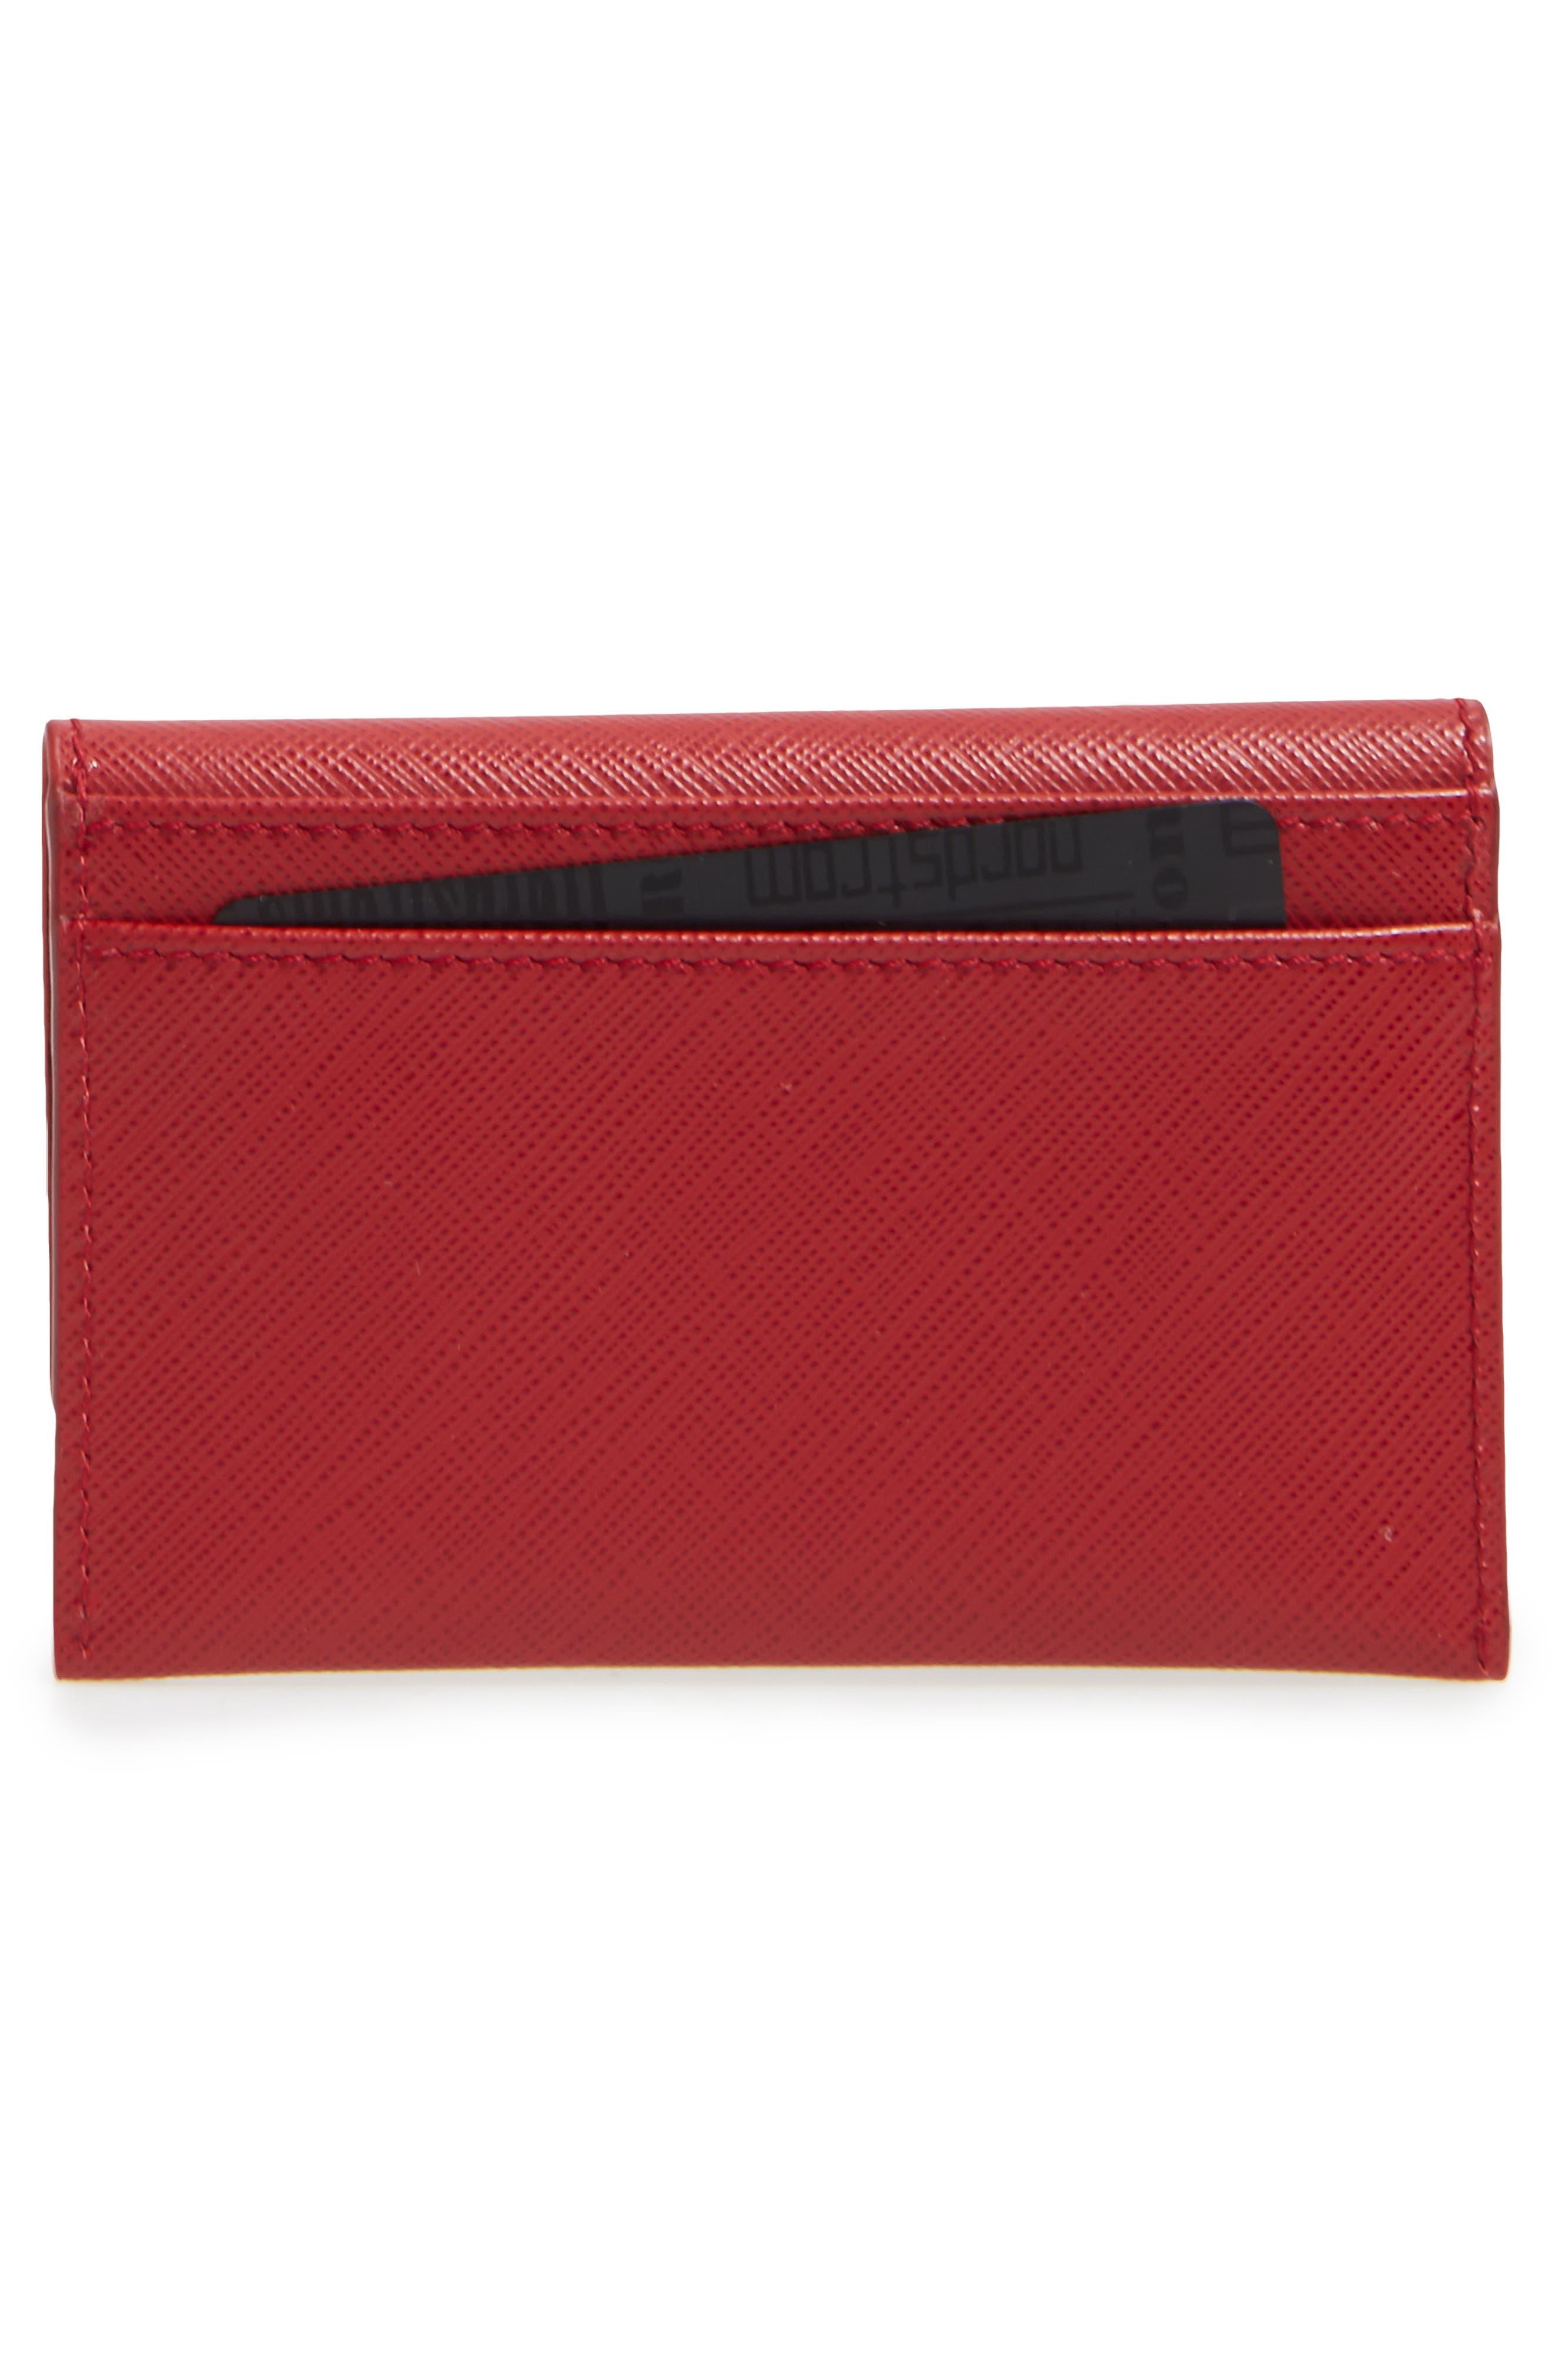 Vara Leather Card Case,                             Alternate thumbnail 2, color,                             600